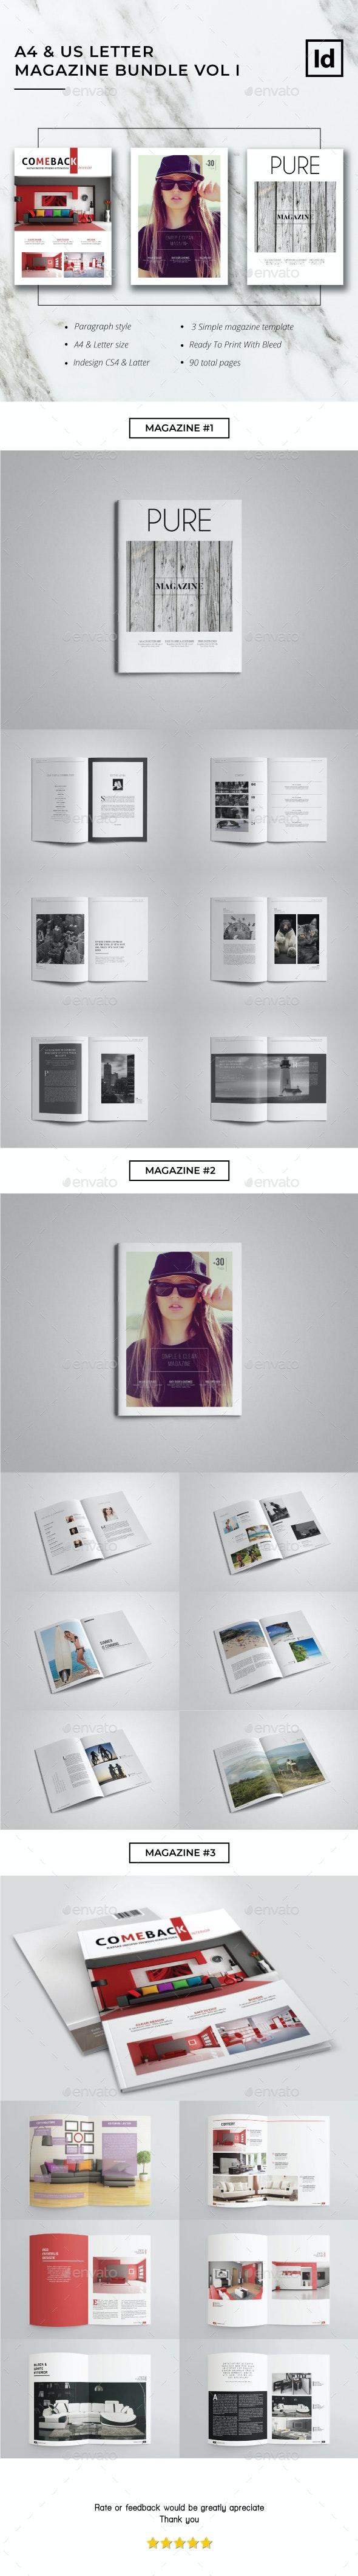 A4 & US Letter Magazine Bundle Vol I - Magazines Print Templates